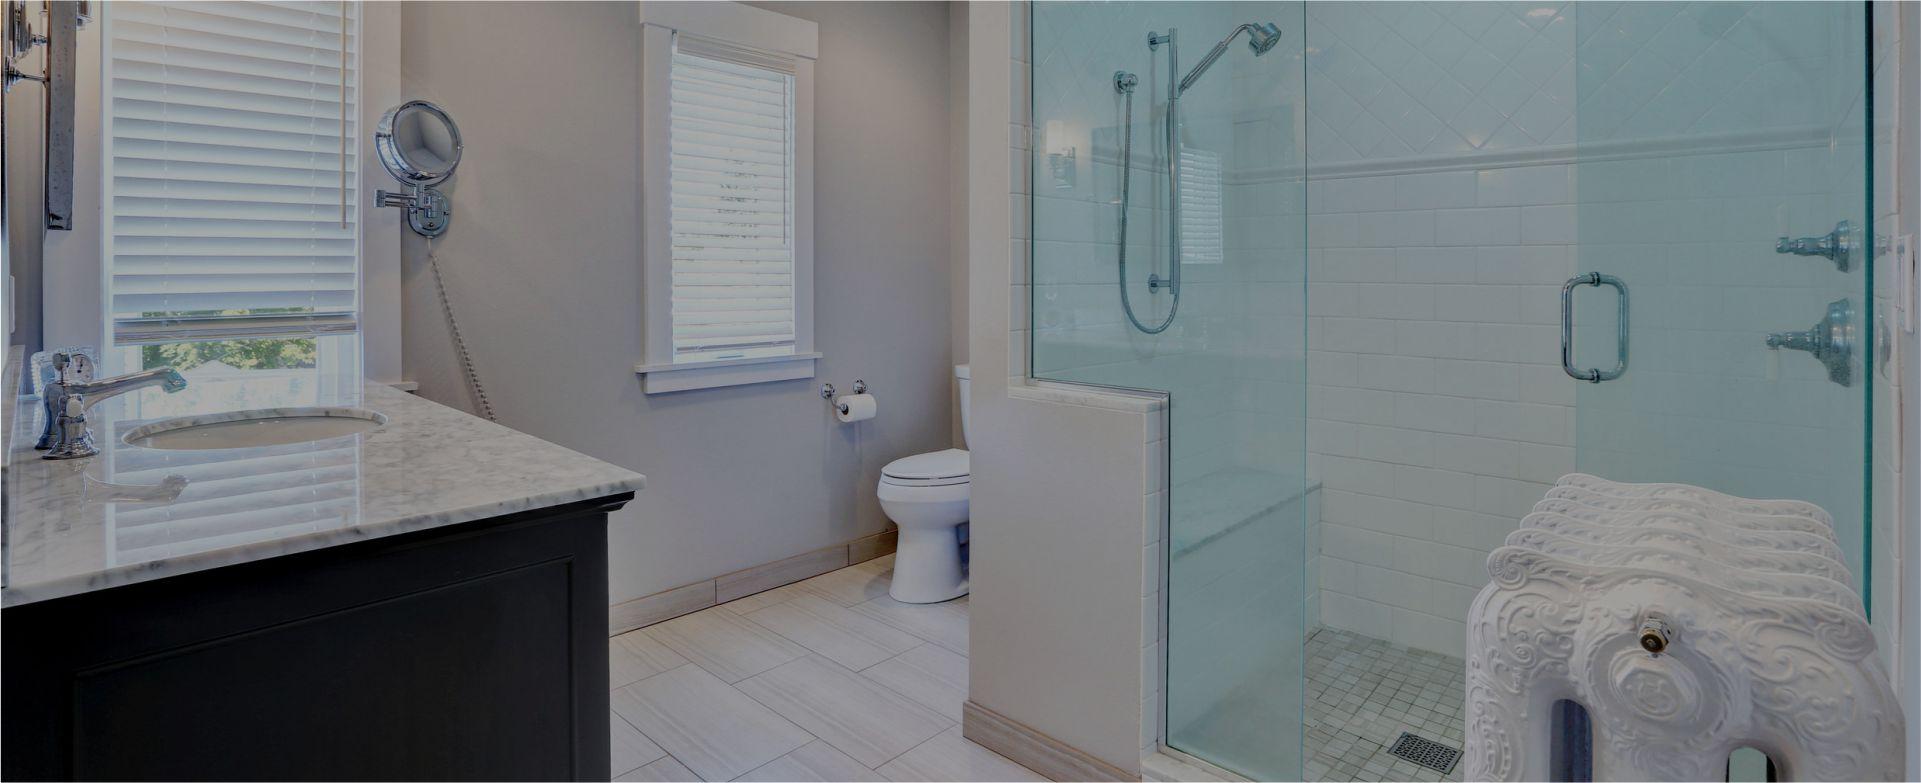 Blindex para banheiros